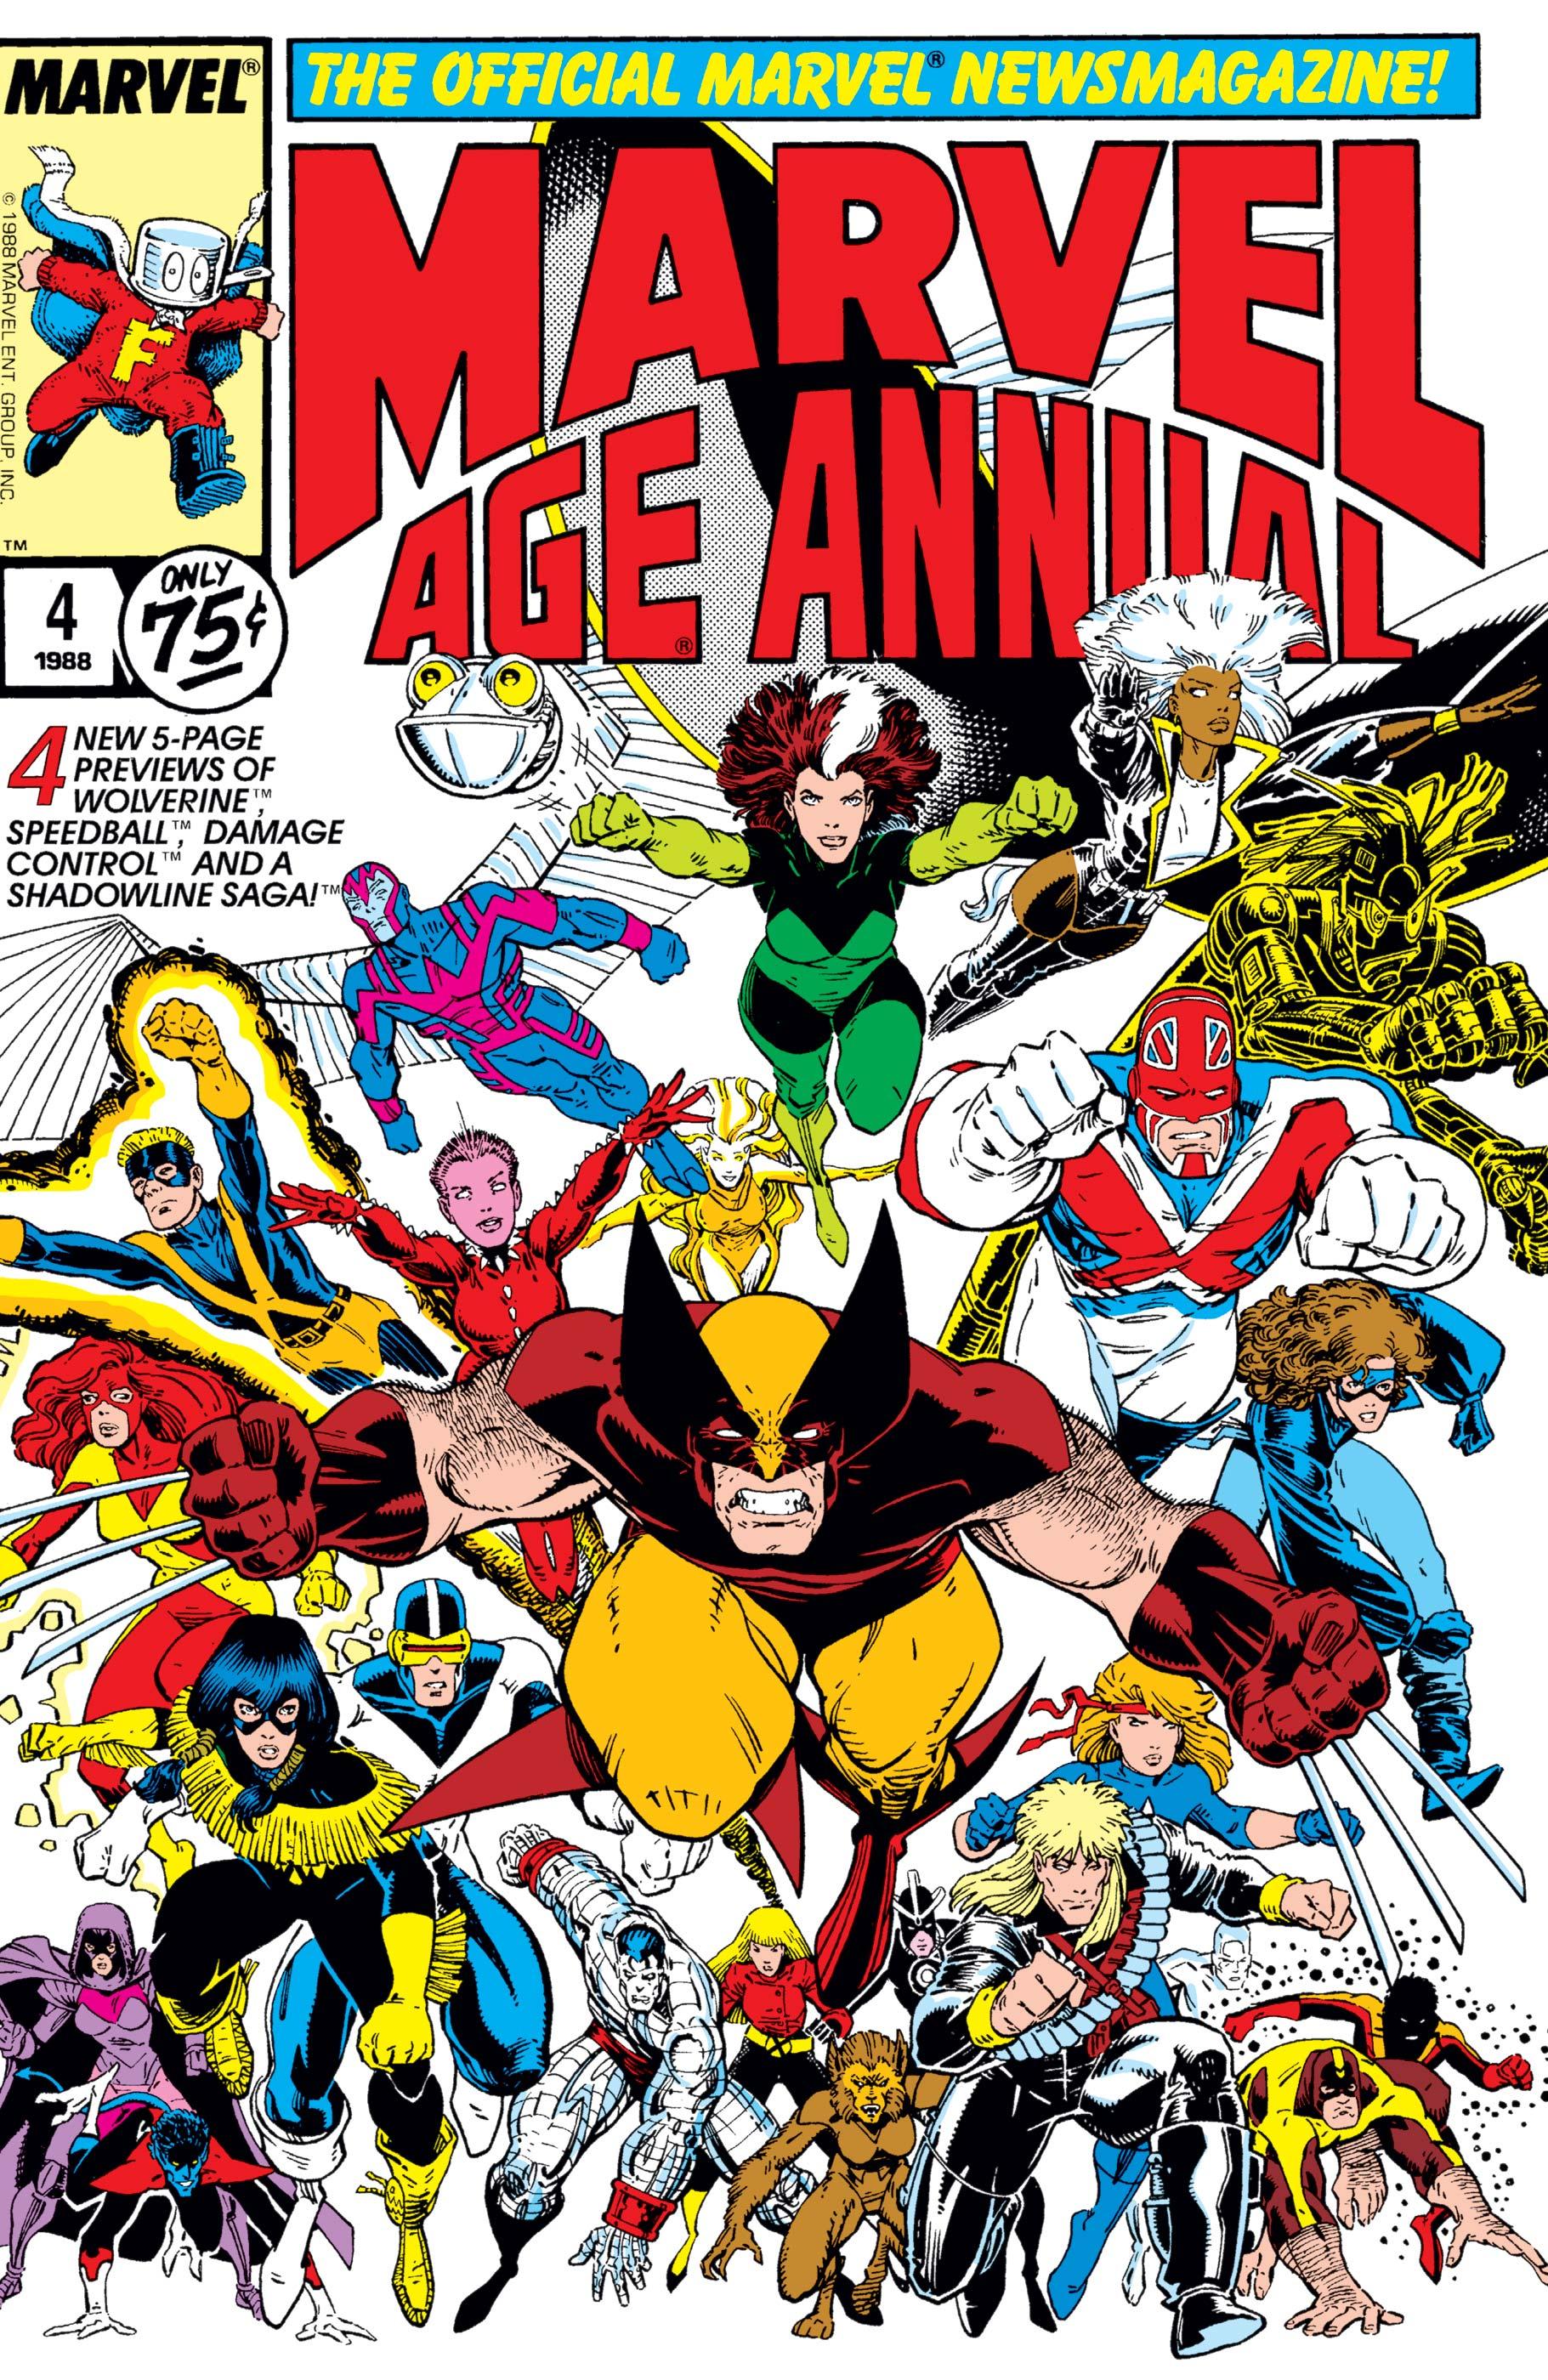 Marvel Age Annual (1985) #4